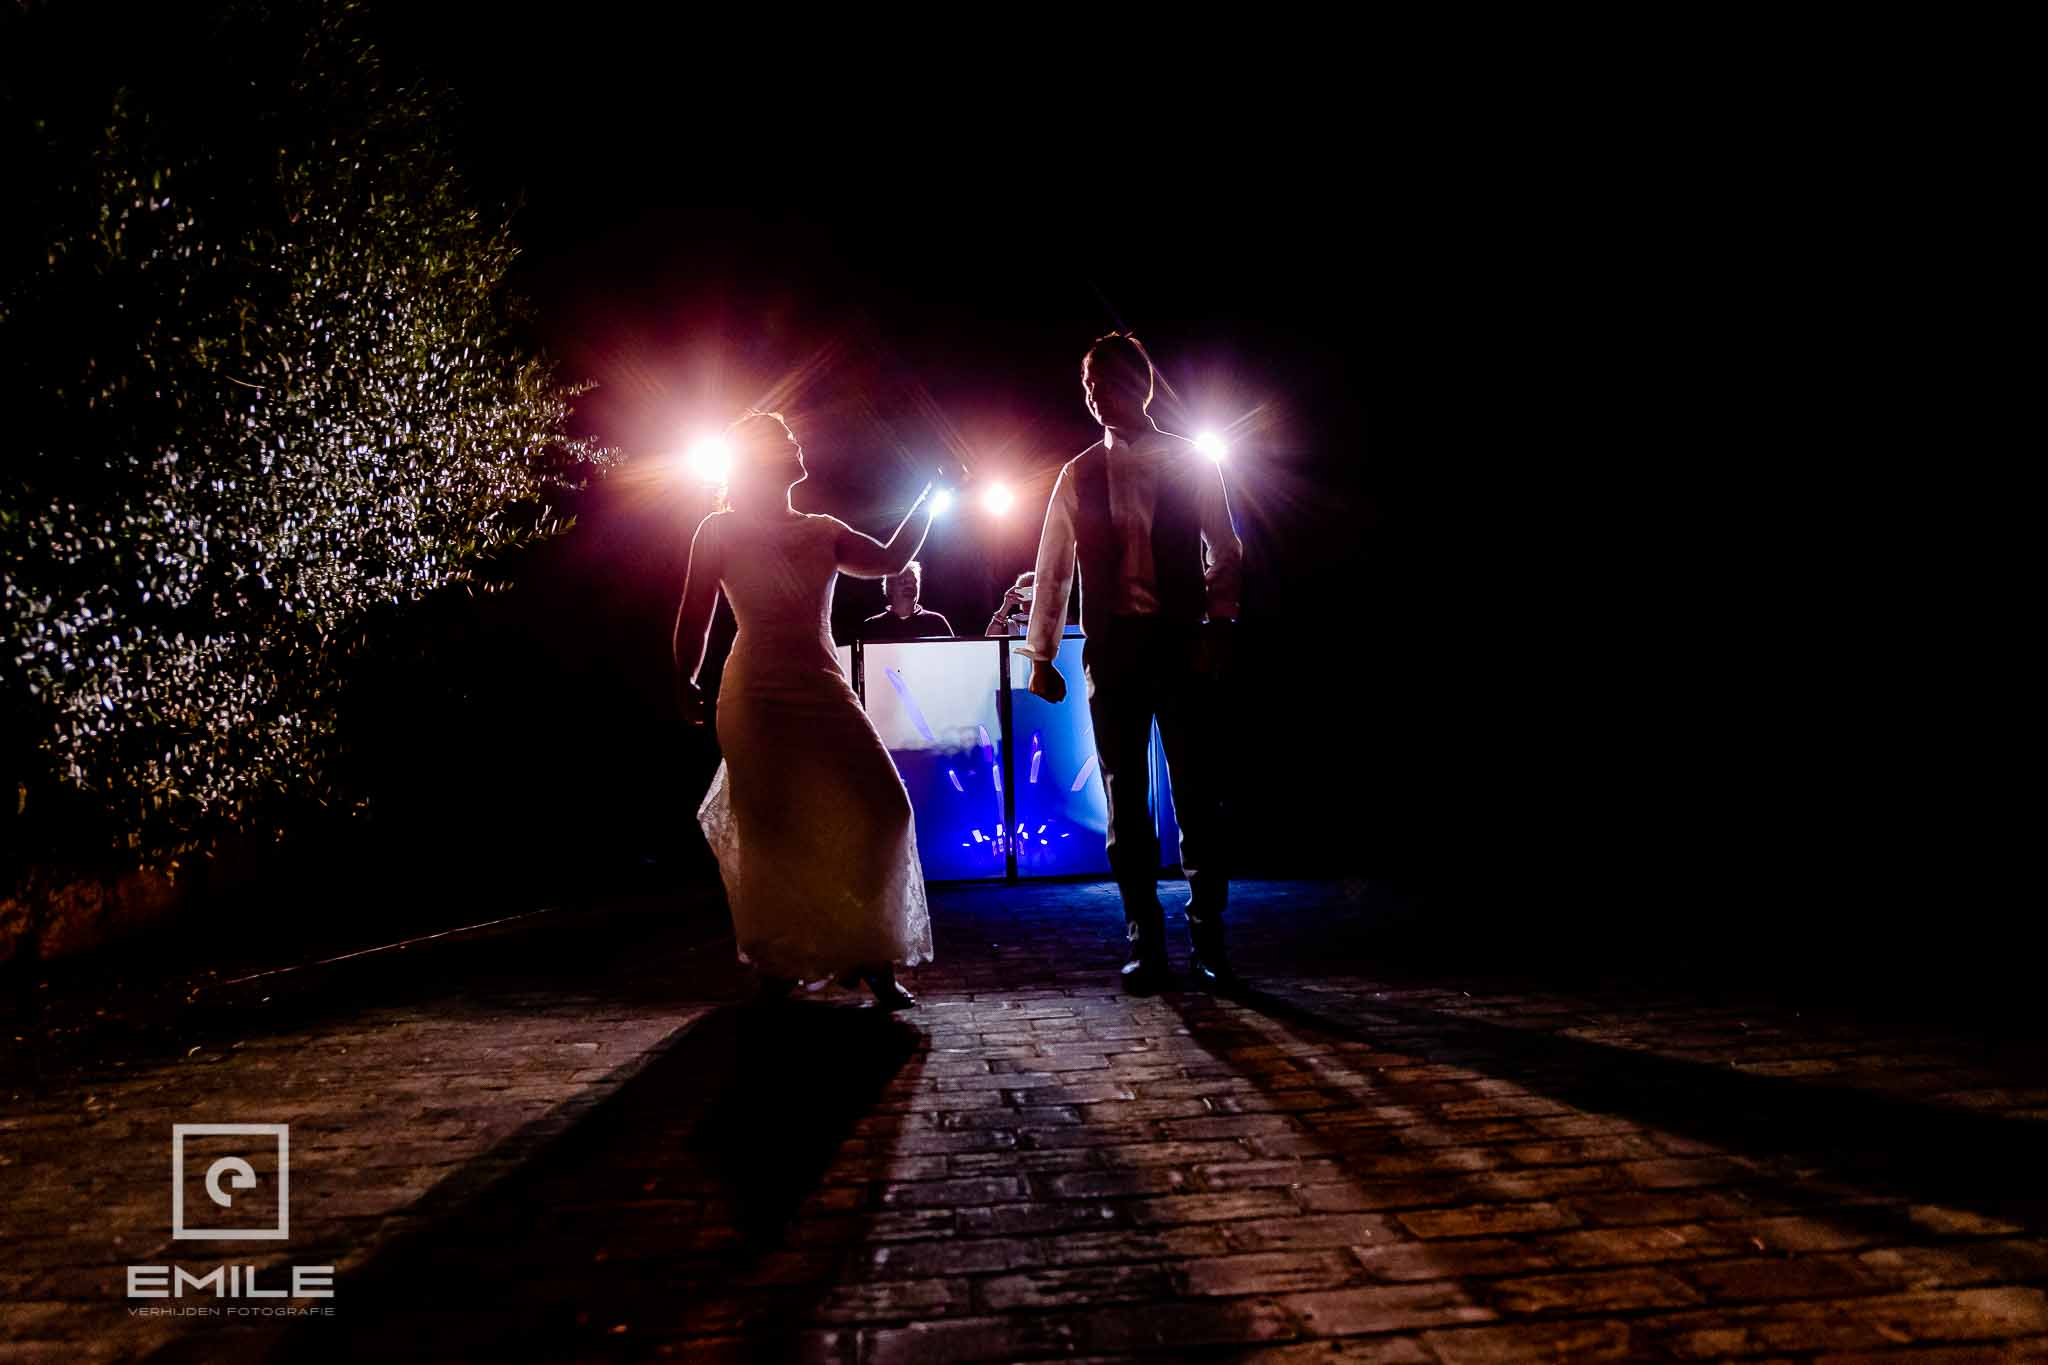 Dansen met tegenlicht -Destination wedding San Gimignano - Toscane Italie - Iris en Job